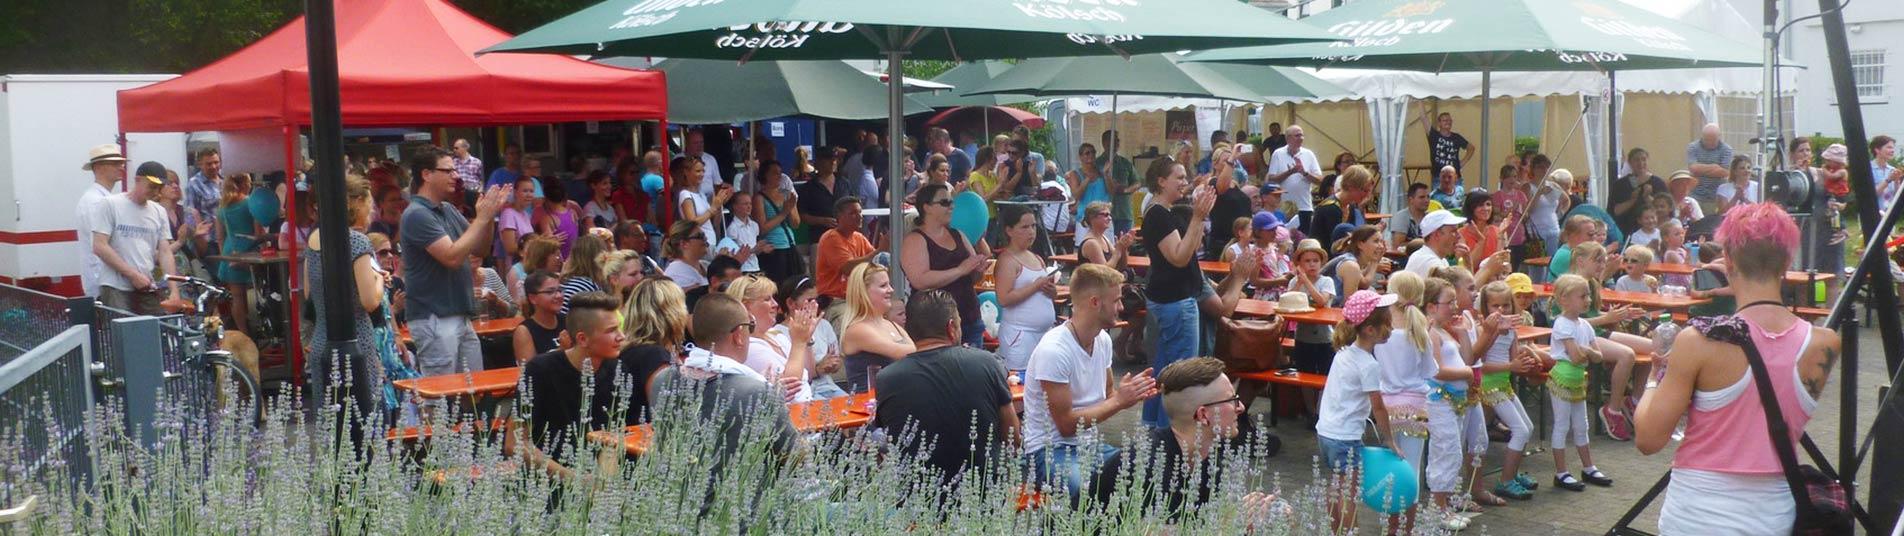 Dorffest in Schildgen